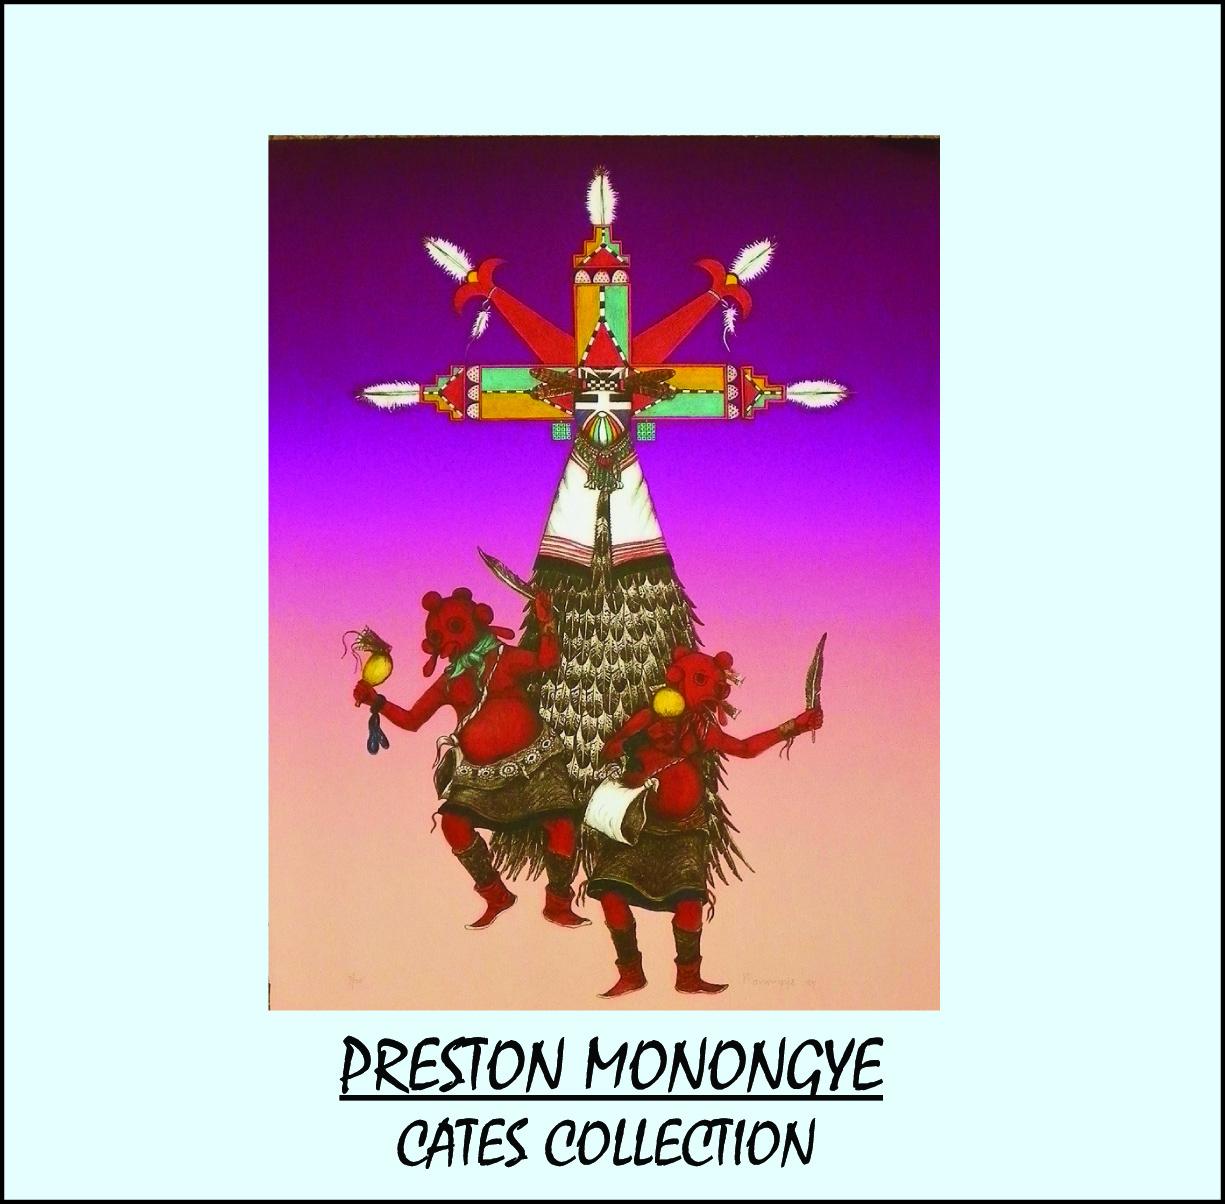 Preston Monongye – Rare Art Prints